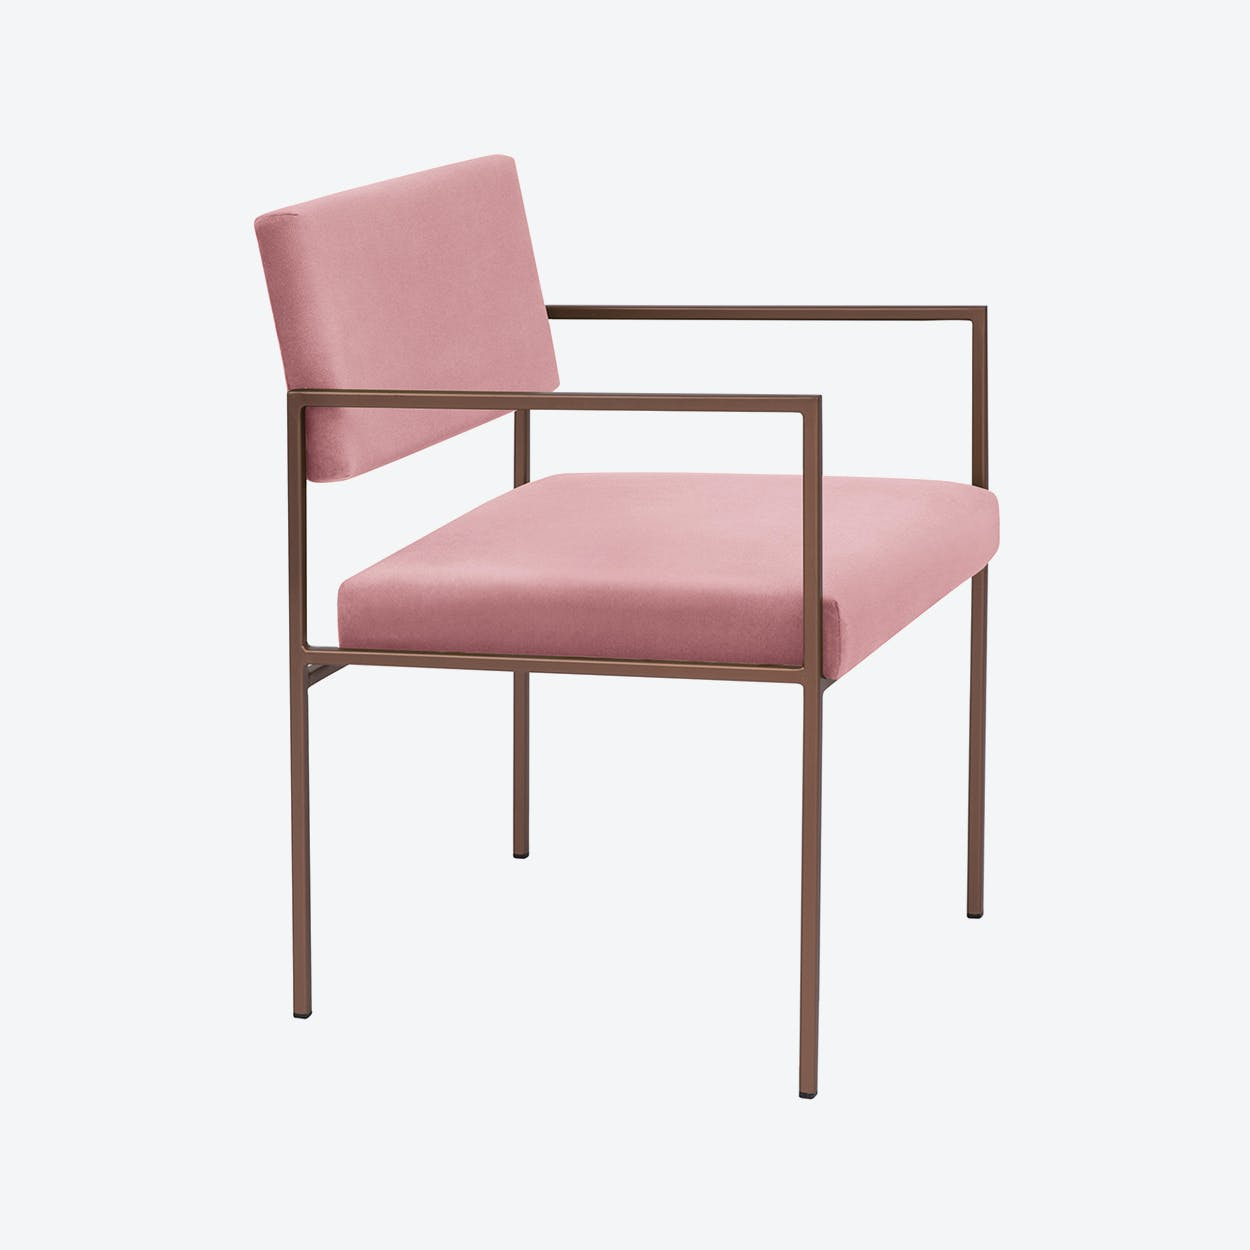 Cube Armchair Copper - Velvet-Line in Vintage-Pink